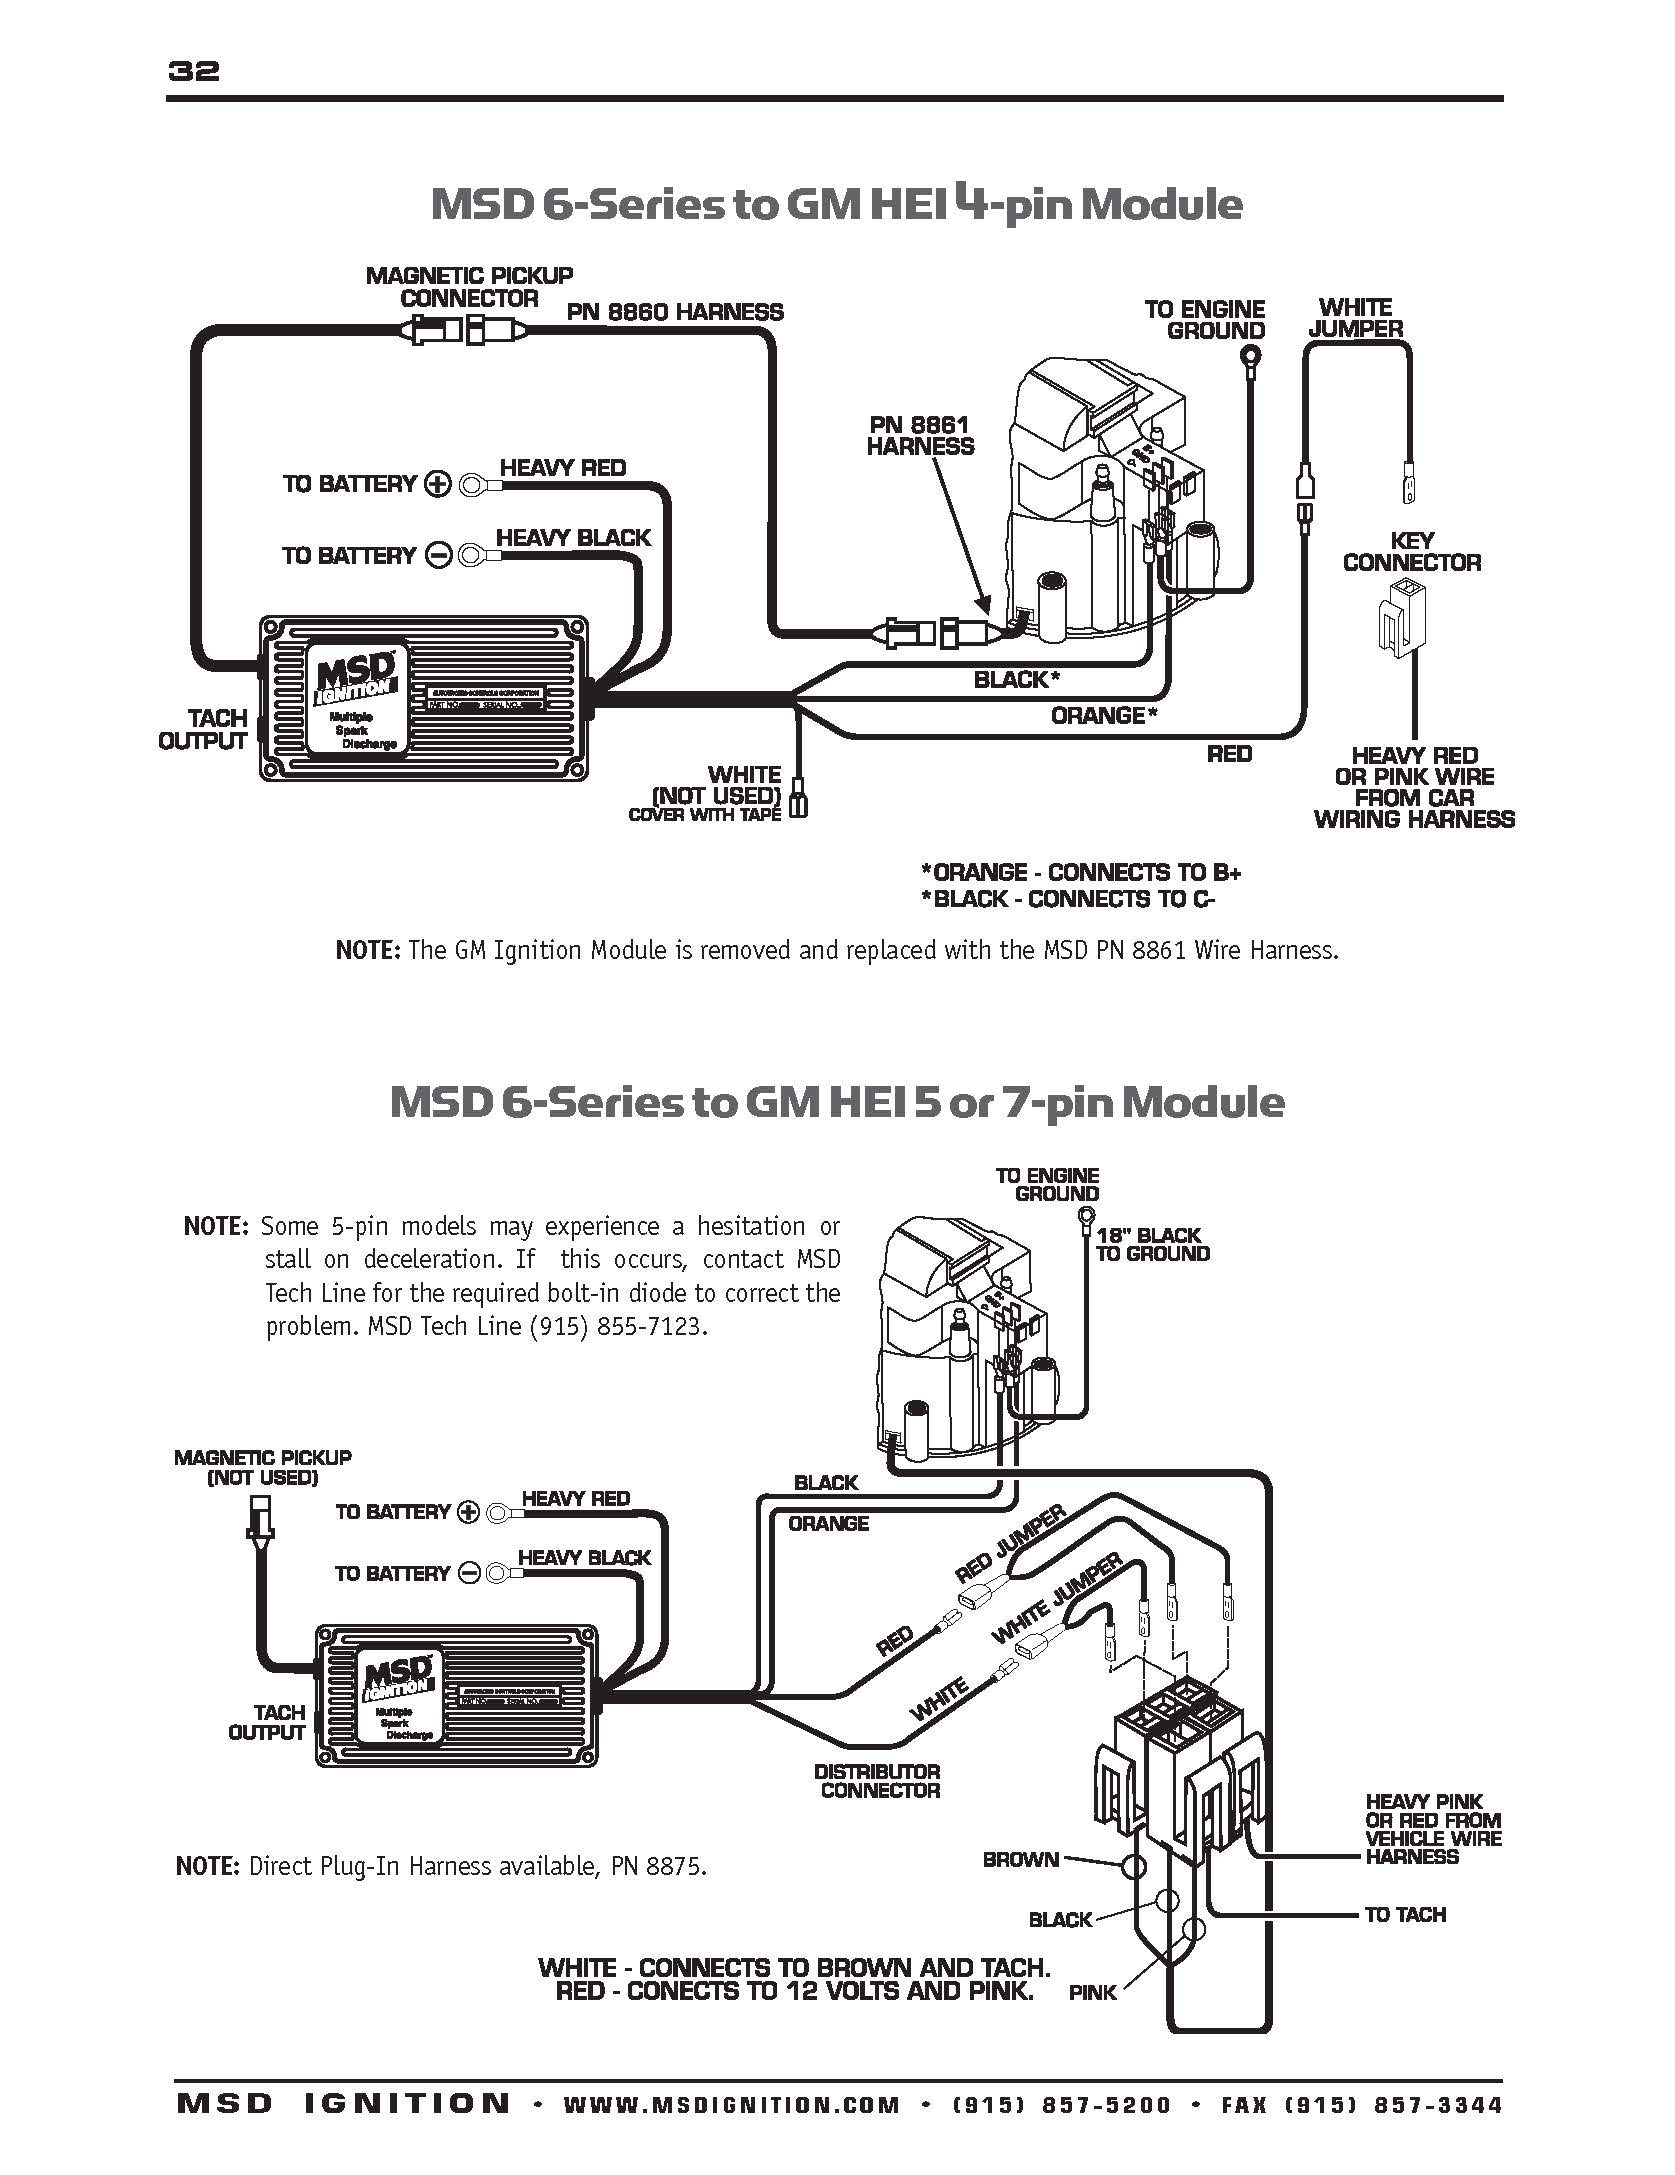 msd tach adapter wiring diagram 3 1 kenmo lp de \u2022msd 6al wiring chevrolet wiring diagram online rh 16 18 lightandzaun de msd 8920 tach adapter wiring diagram 8910 eis msd tach adapter wiring diagram